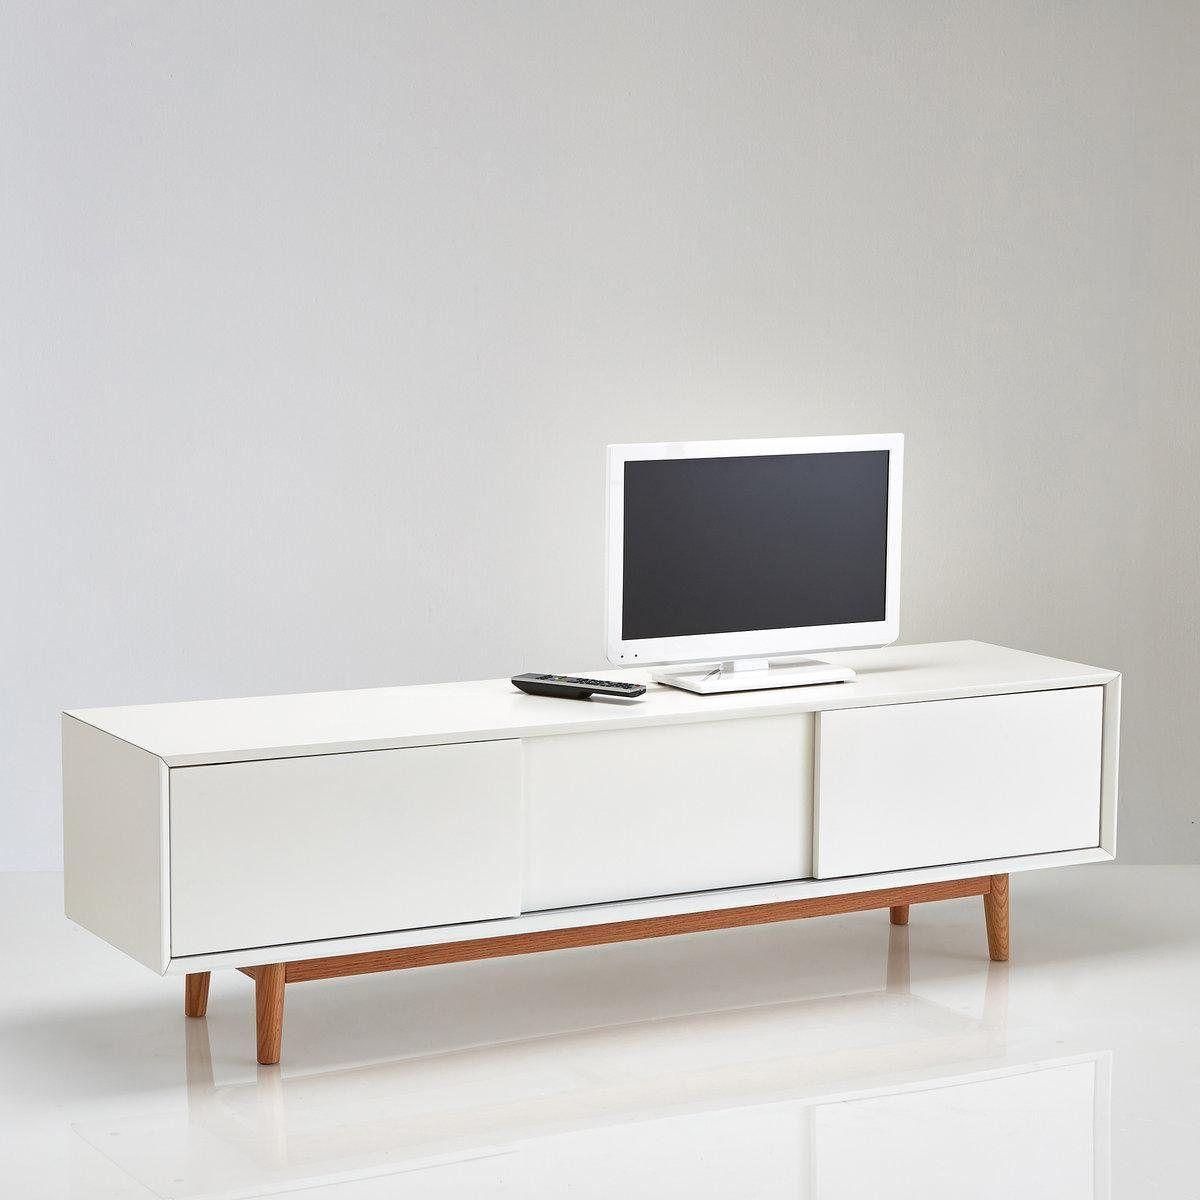 Meuble Tv Jimi - Meuble Tv Vintage 3 Portes Coulissantes Jimi La Redoute La [mjhdah]http://brockfc.com/c/petit-belle-meuble-tv-design-avec-porte-coulissante-meuble-tv-vintage-3-portes-coulissantes-jimi-la-redoute-la-936×936.jpg